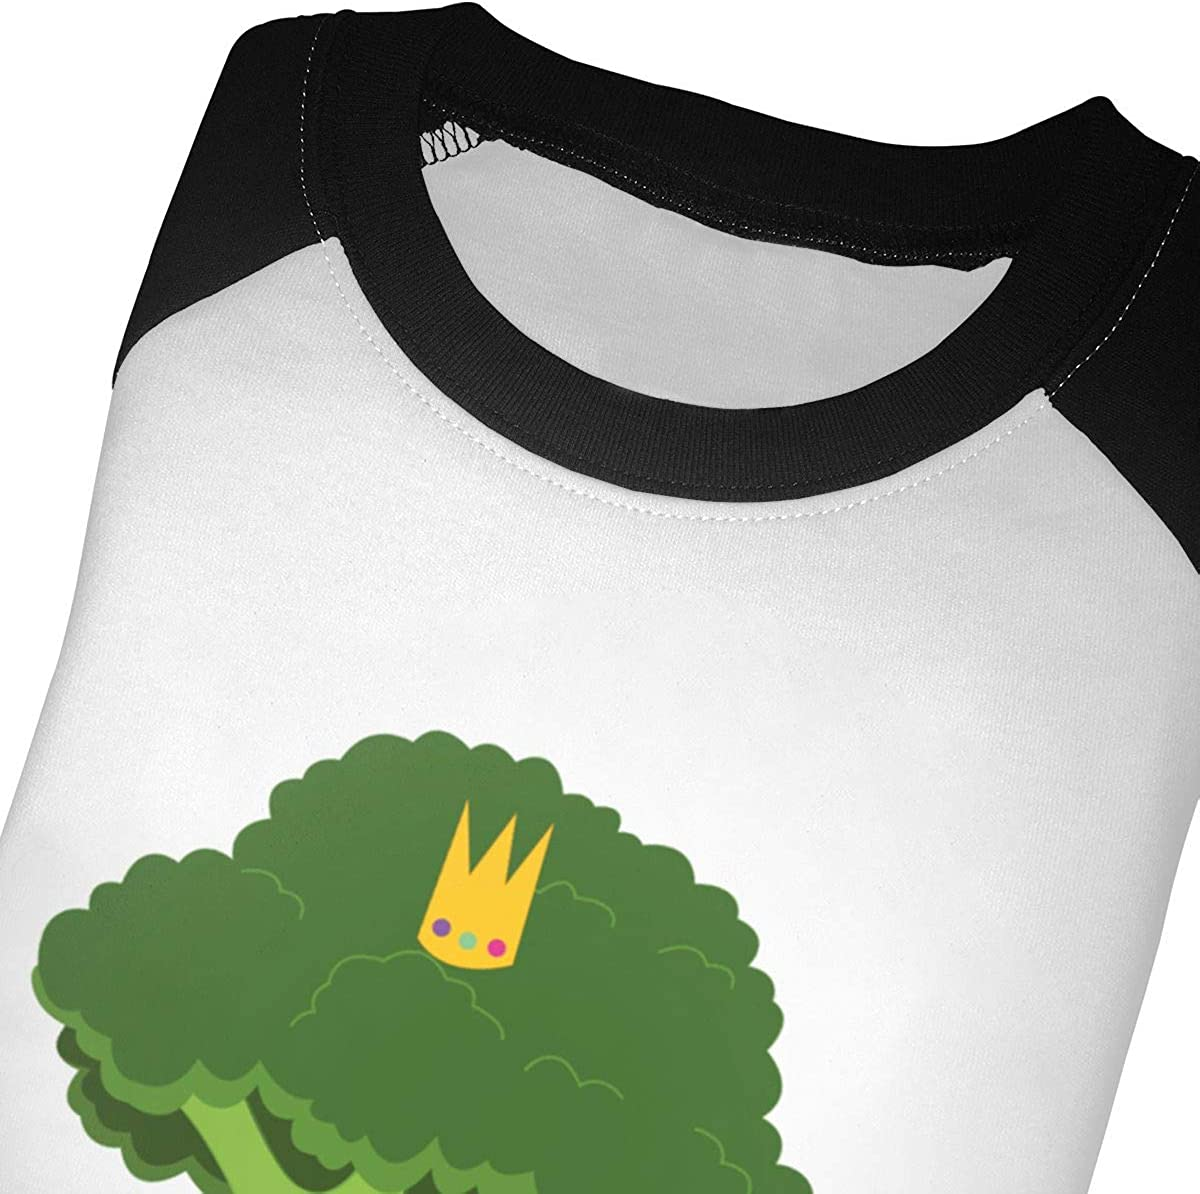 Kocvbng I Playing Guitar Broccoli Raglan 3//4 Sleeve T-Shirt for Girls Boy